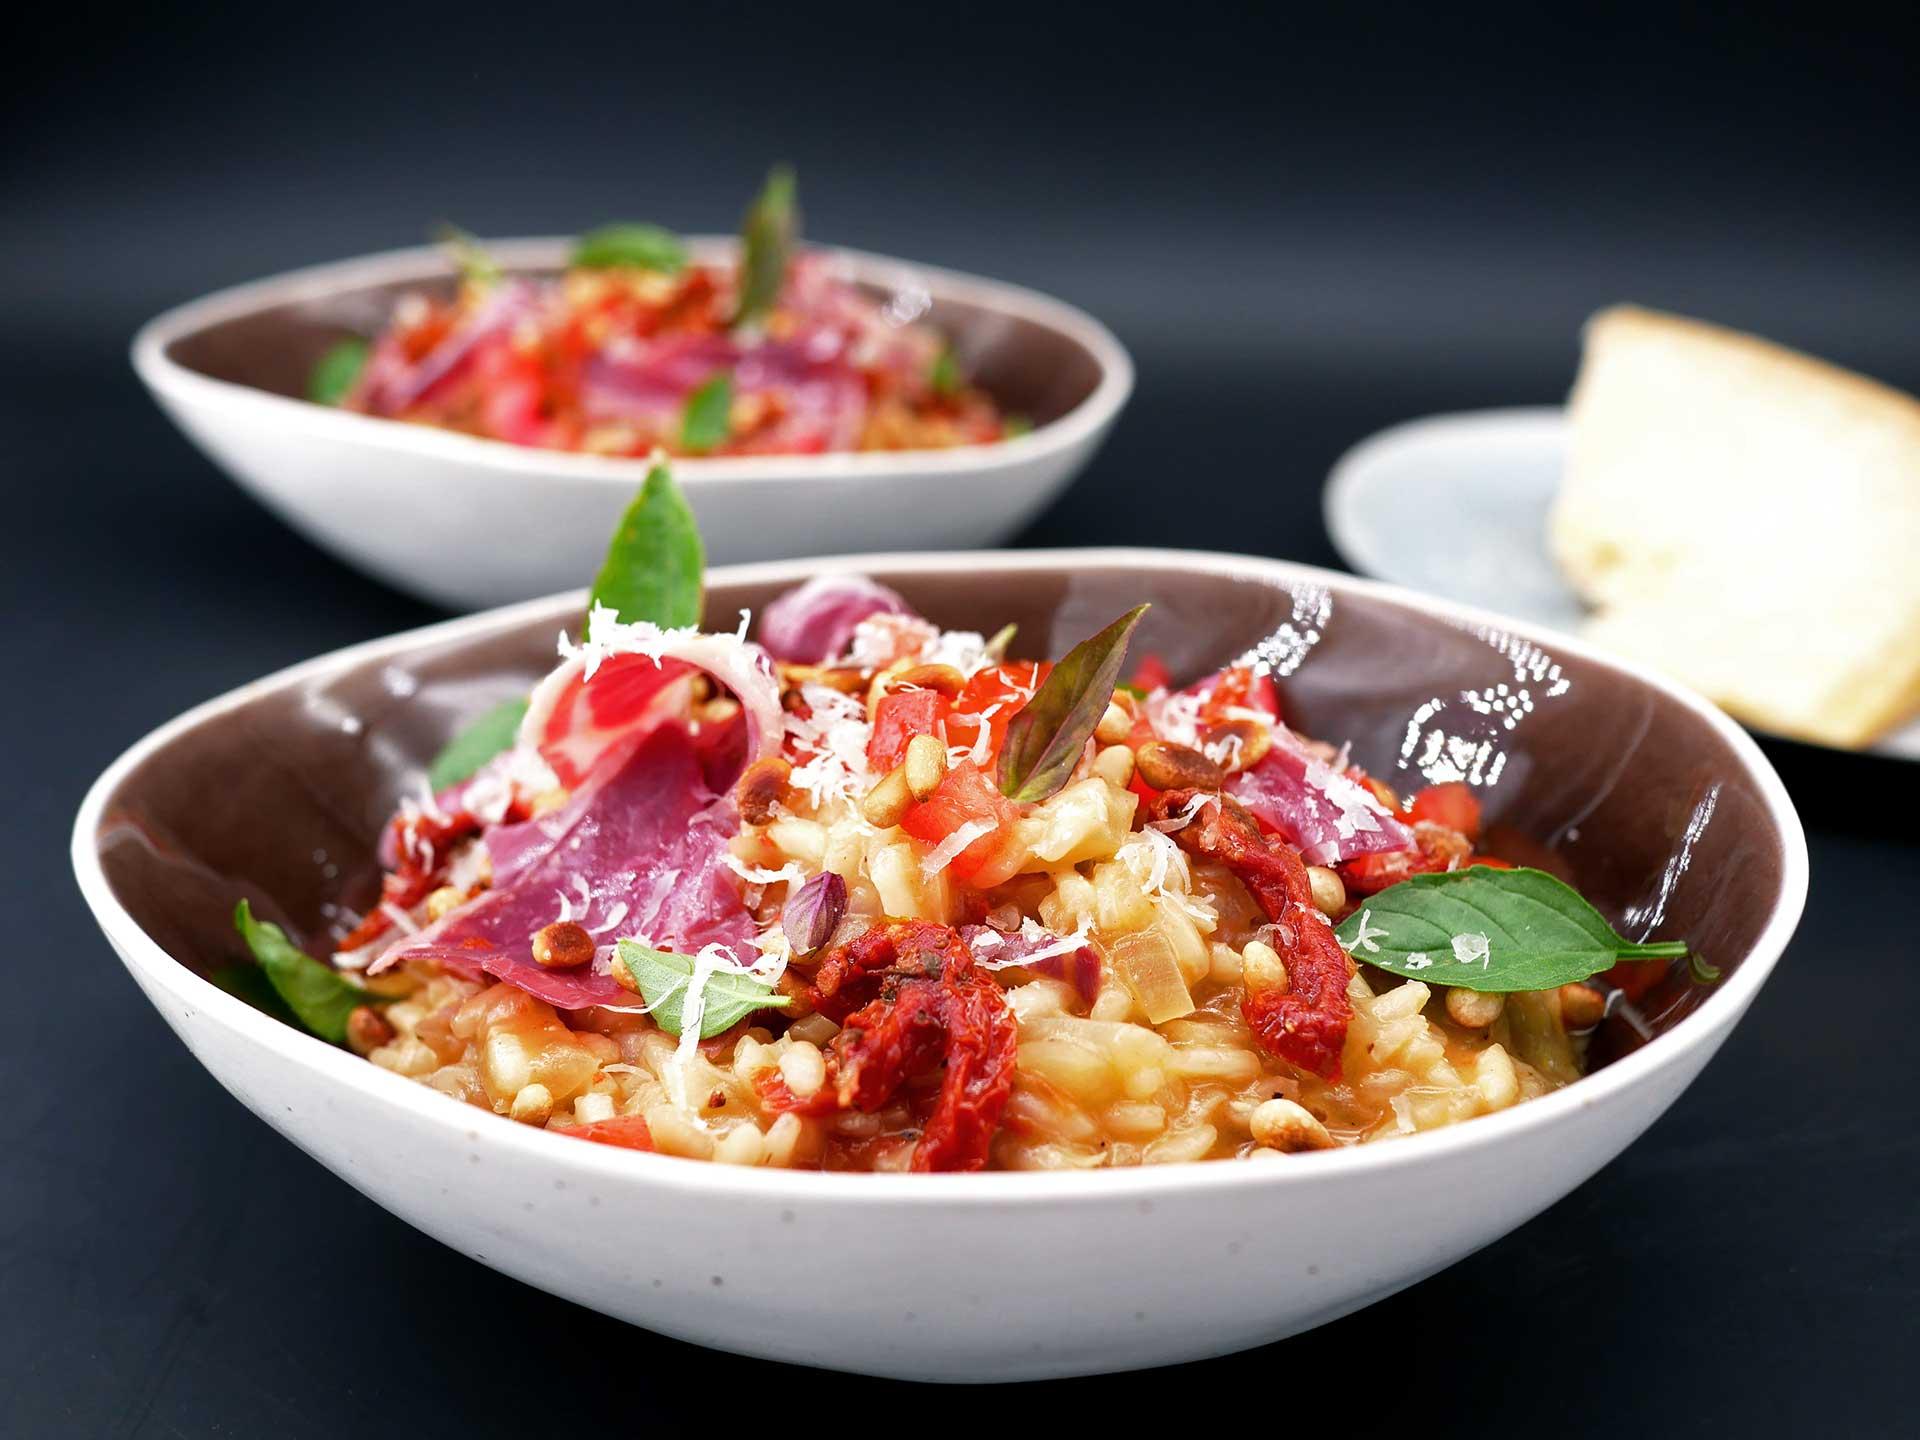 Risotto au jambon pata negra et tomates confites